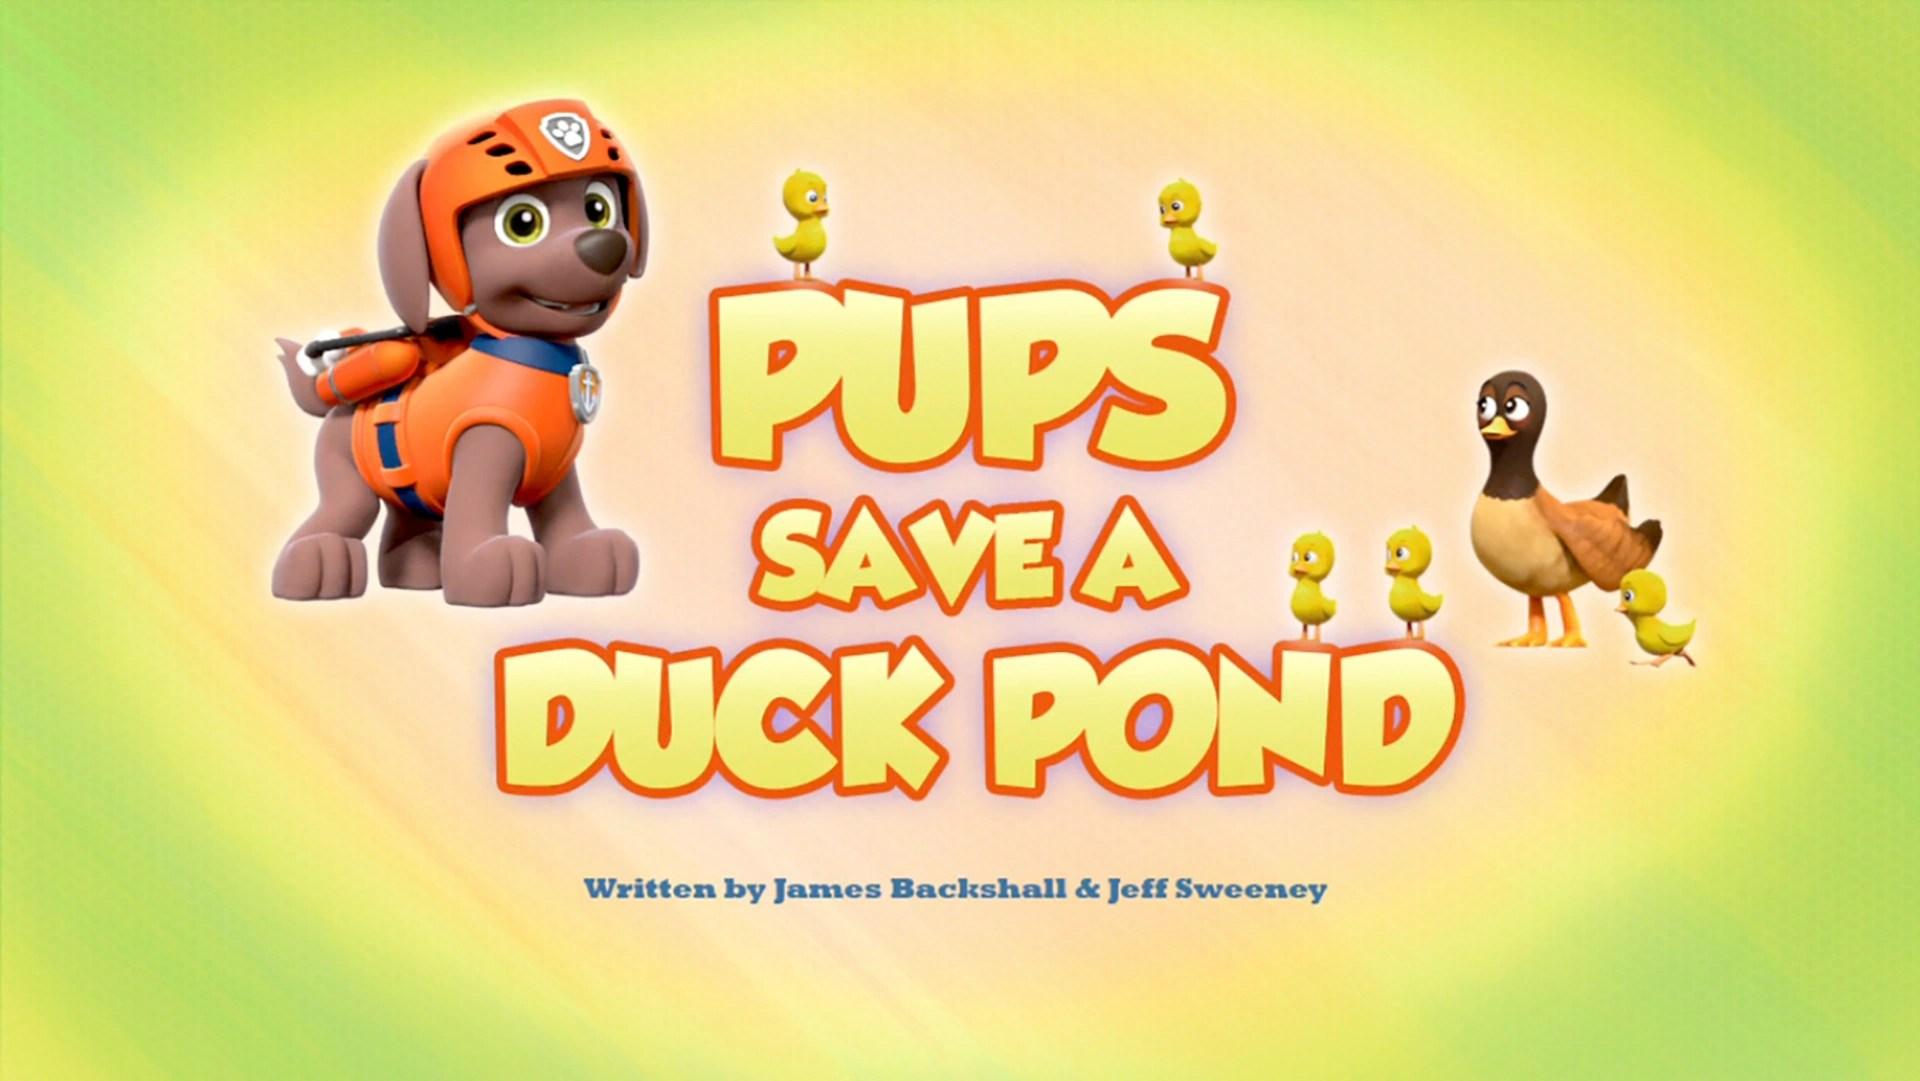 Pups Save A Duck Pond PAW Patrol Wiki FANDOM Powered